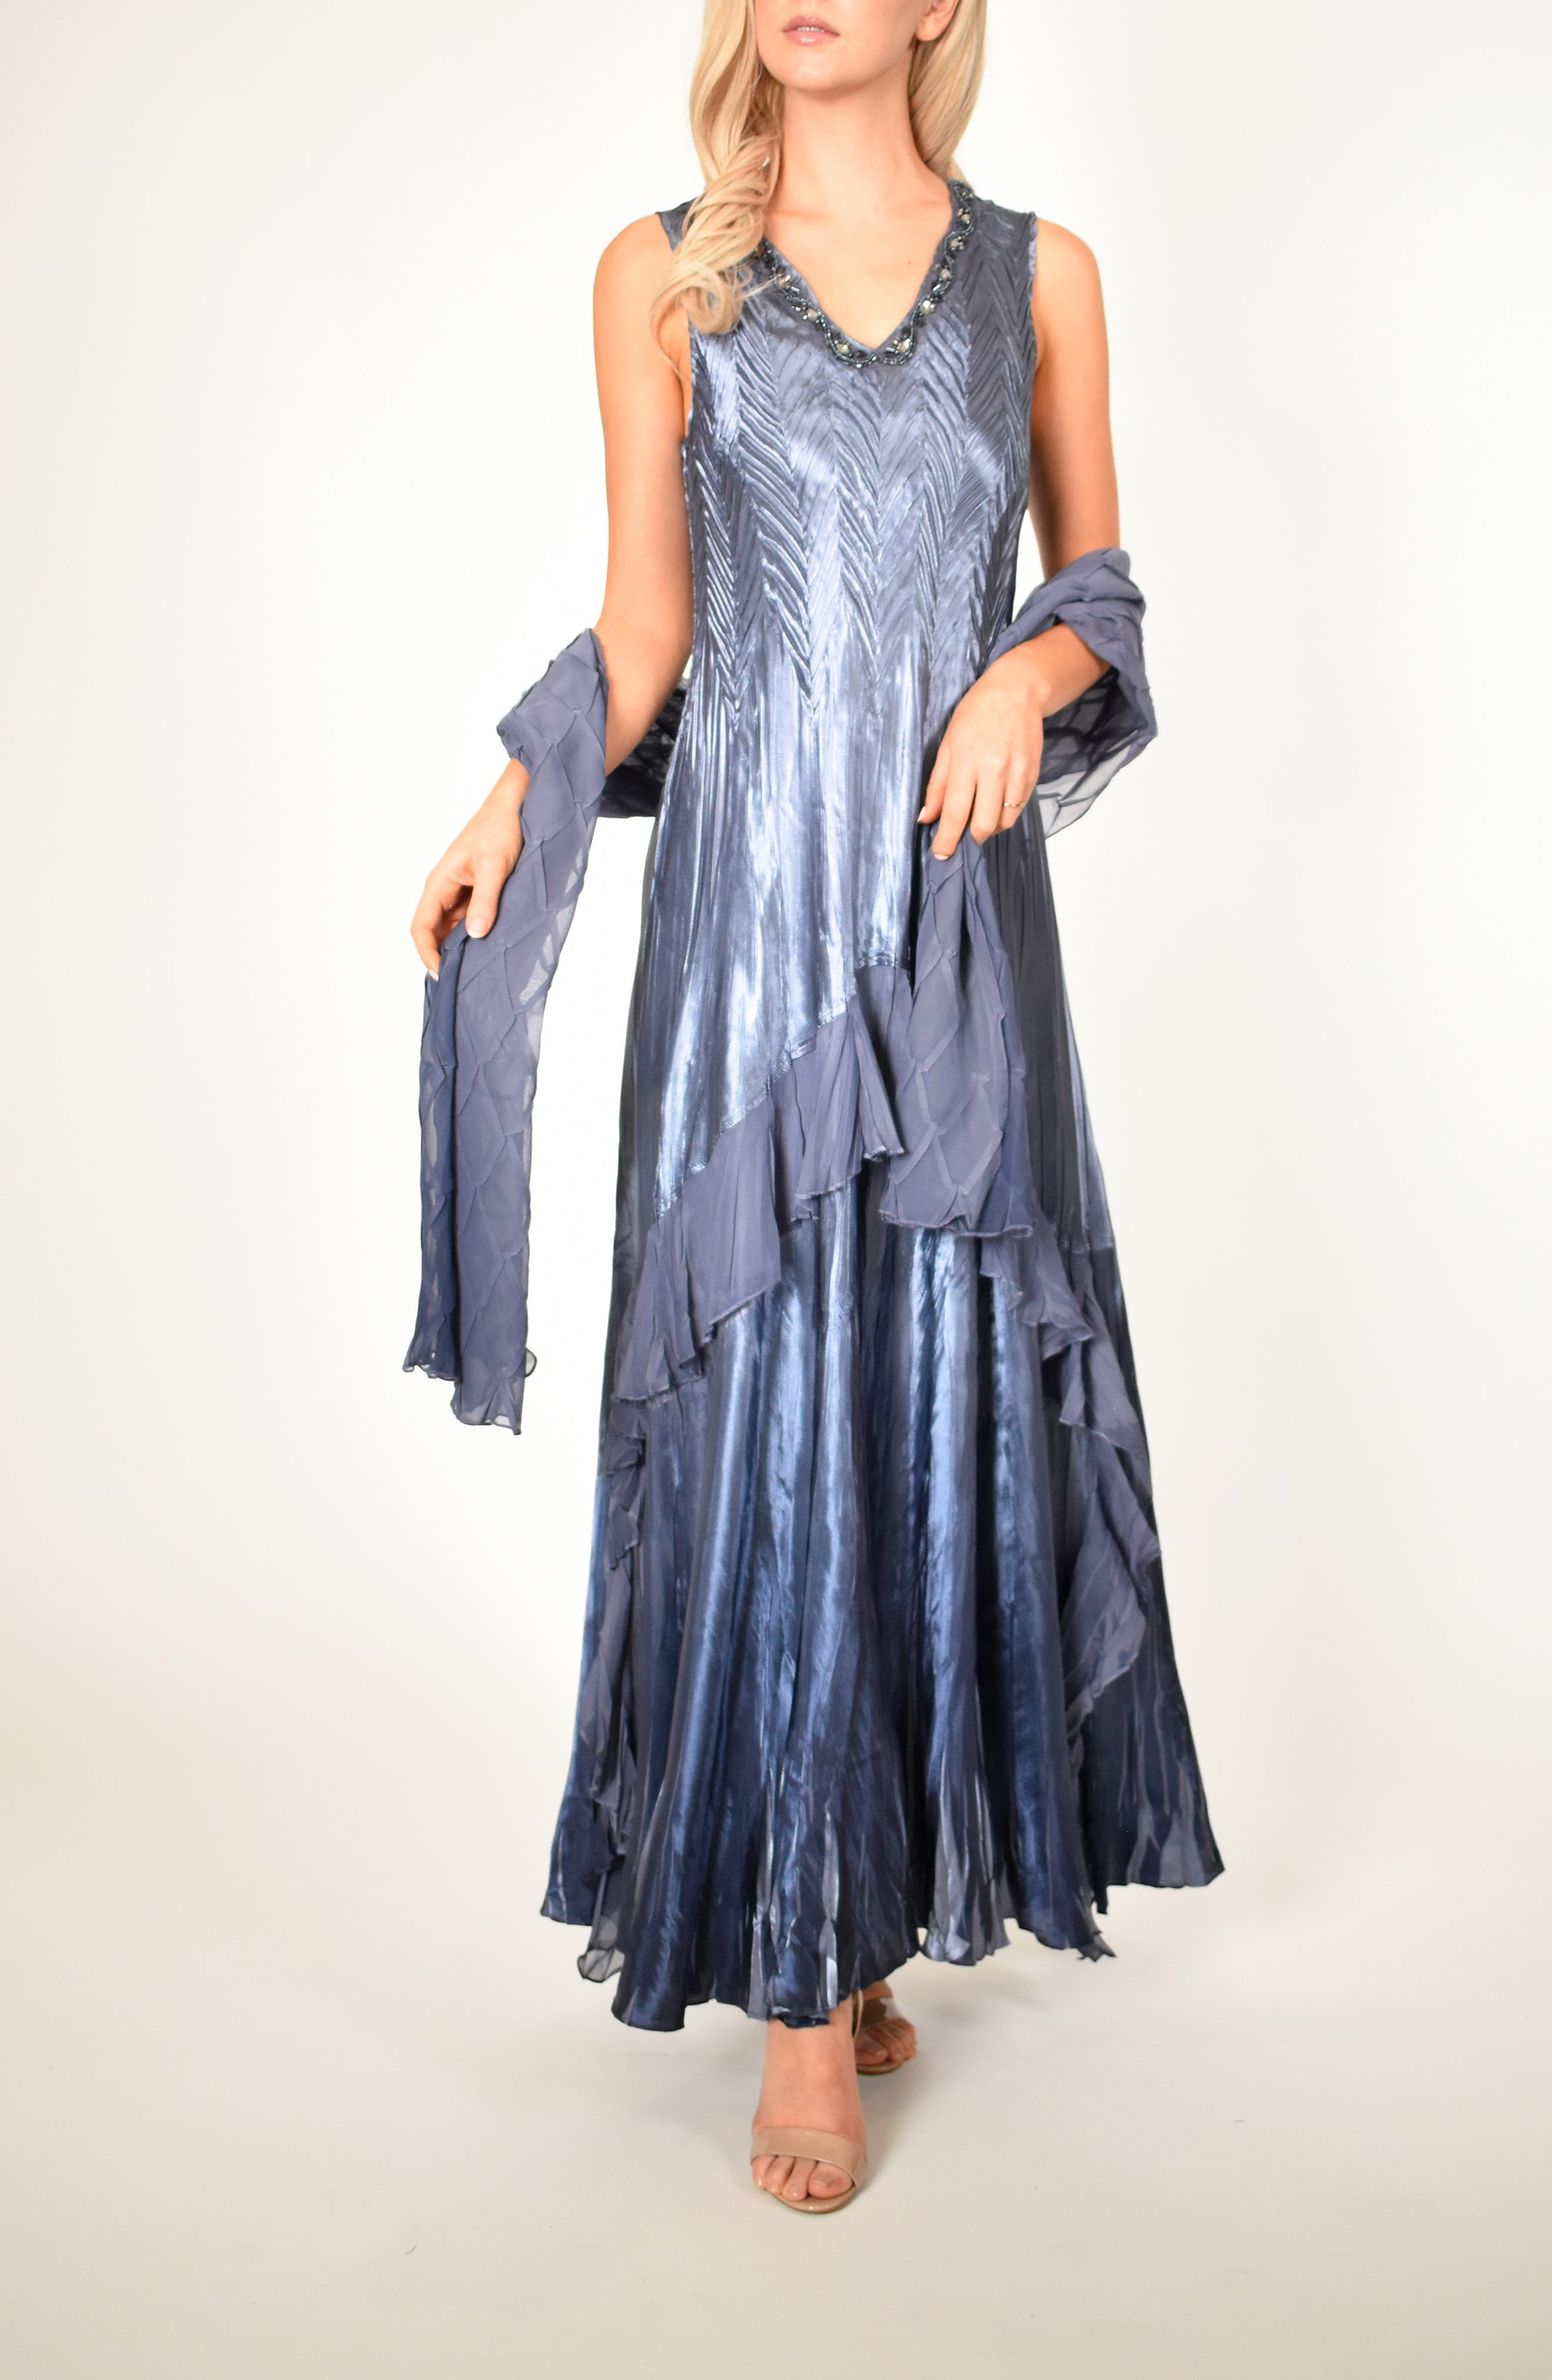 Petite Komarov Beaded V-Neck Charmeuse & Chiffon Evening Dress With Wrap, Blue